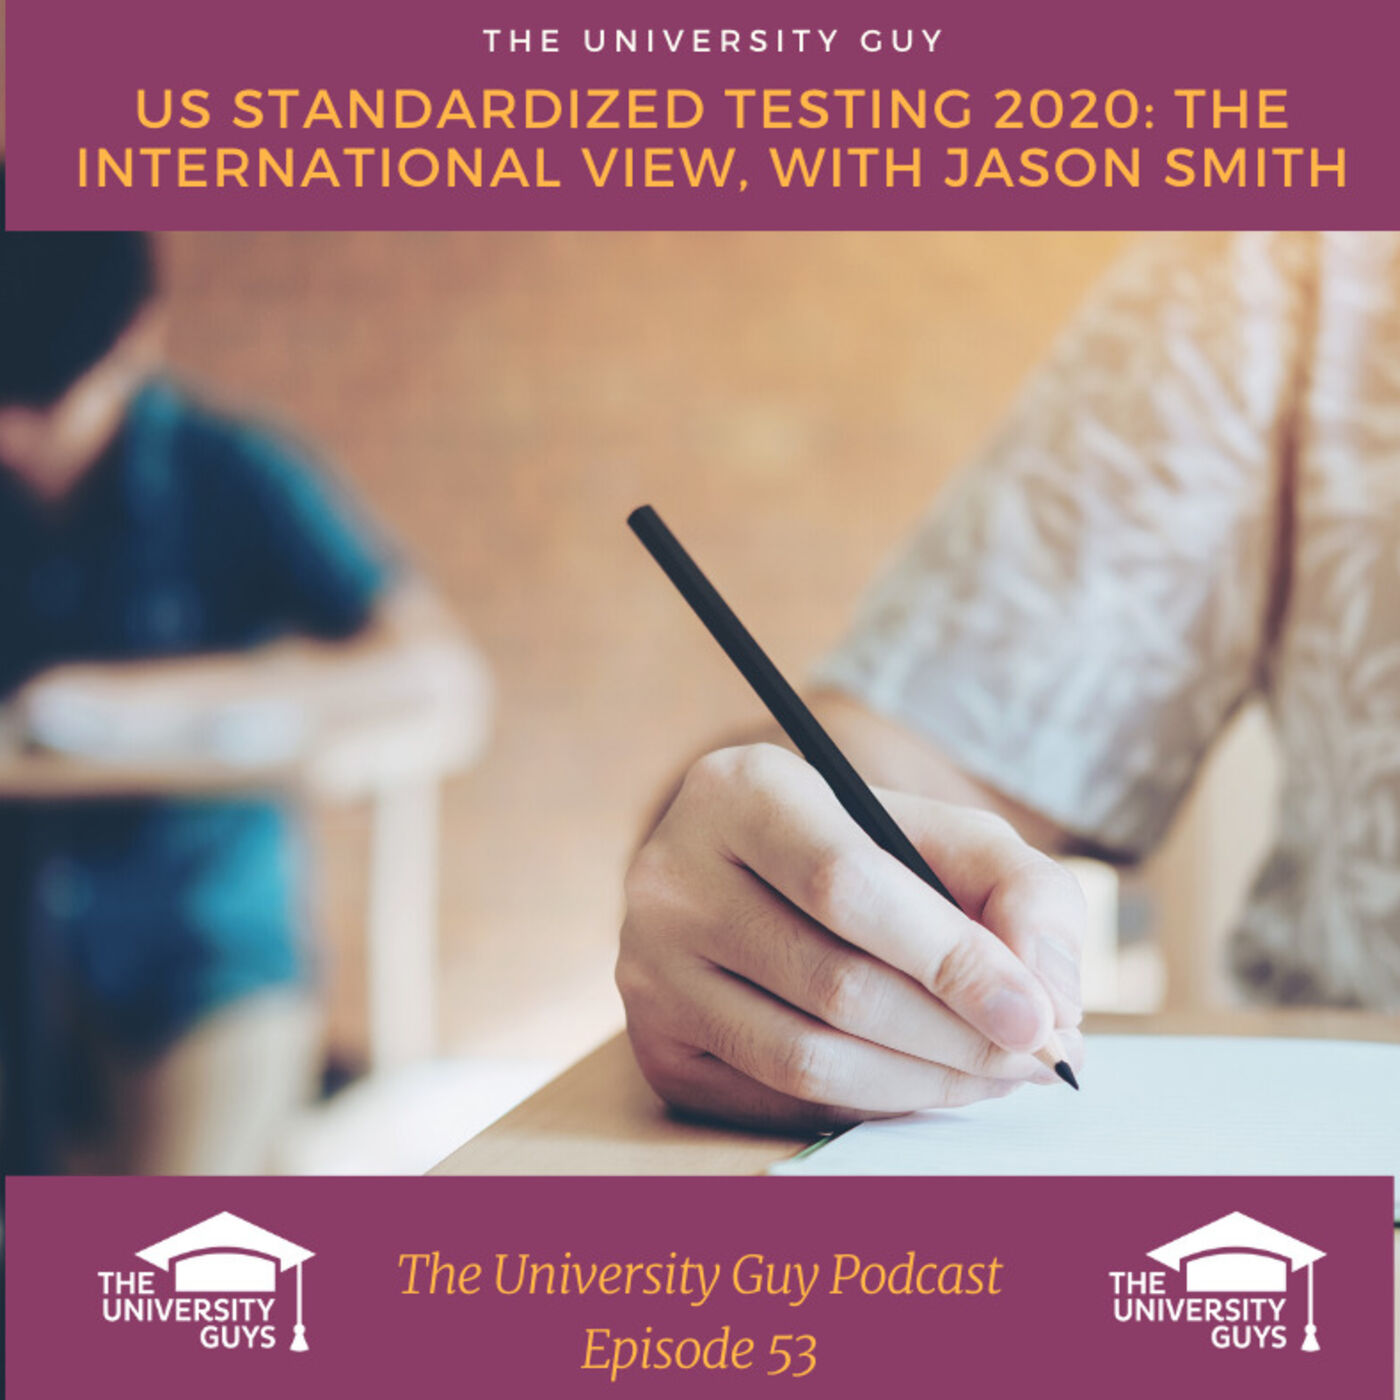 Episode 53: US Standardized Testing 2020. The international view, with Jason Smith